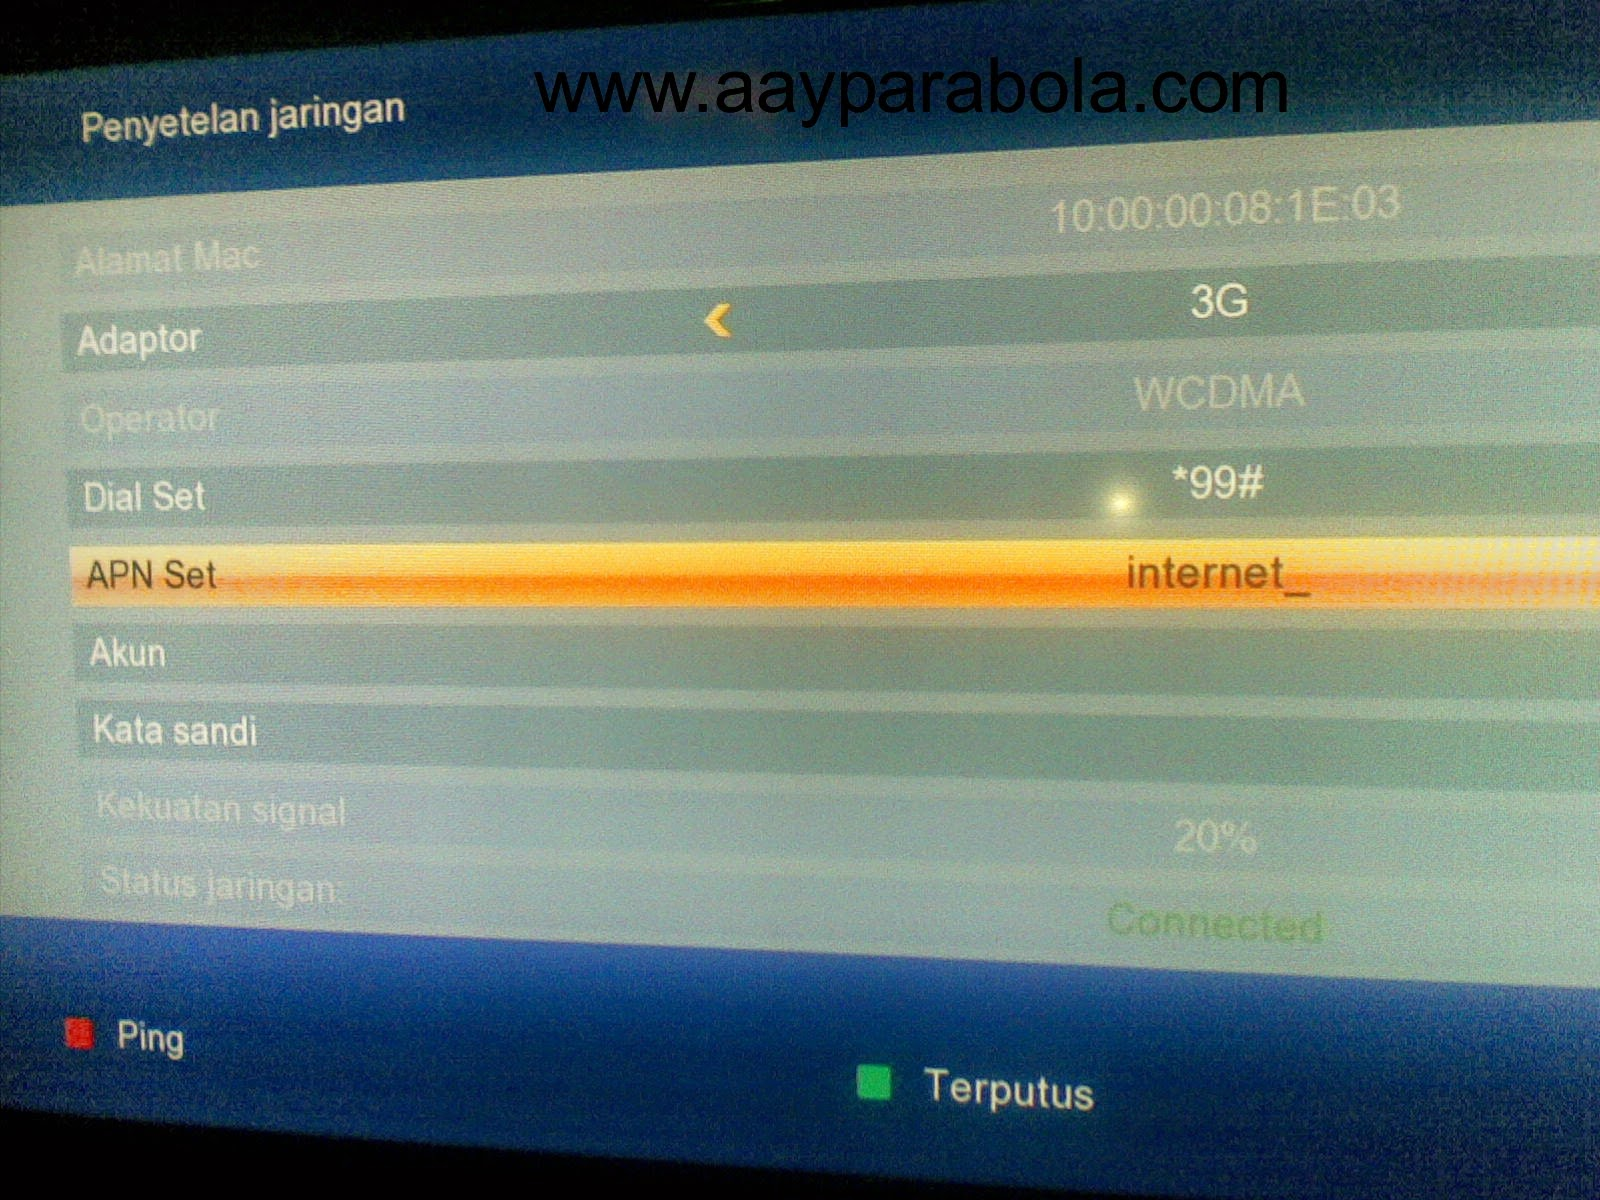 Aay Parabola Receiver Matrix Sinema Hd Pvr Mpeg 4 Free Channel Premium Selamanya Lifetime Support Power Vu Tadberg Bisskey Ccamd Youtuber Koneksi Dengan Mdem Di Jaringan 3g Gprs